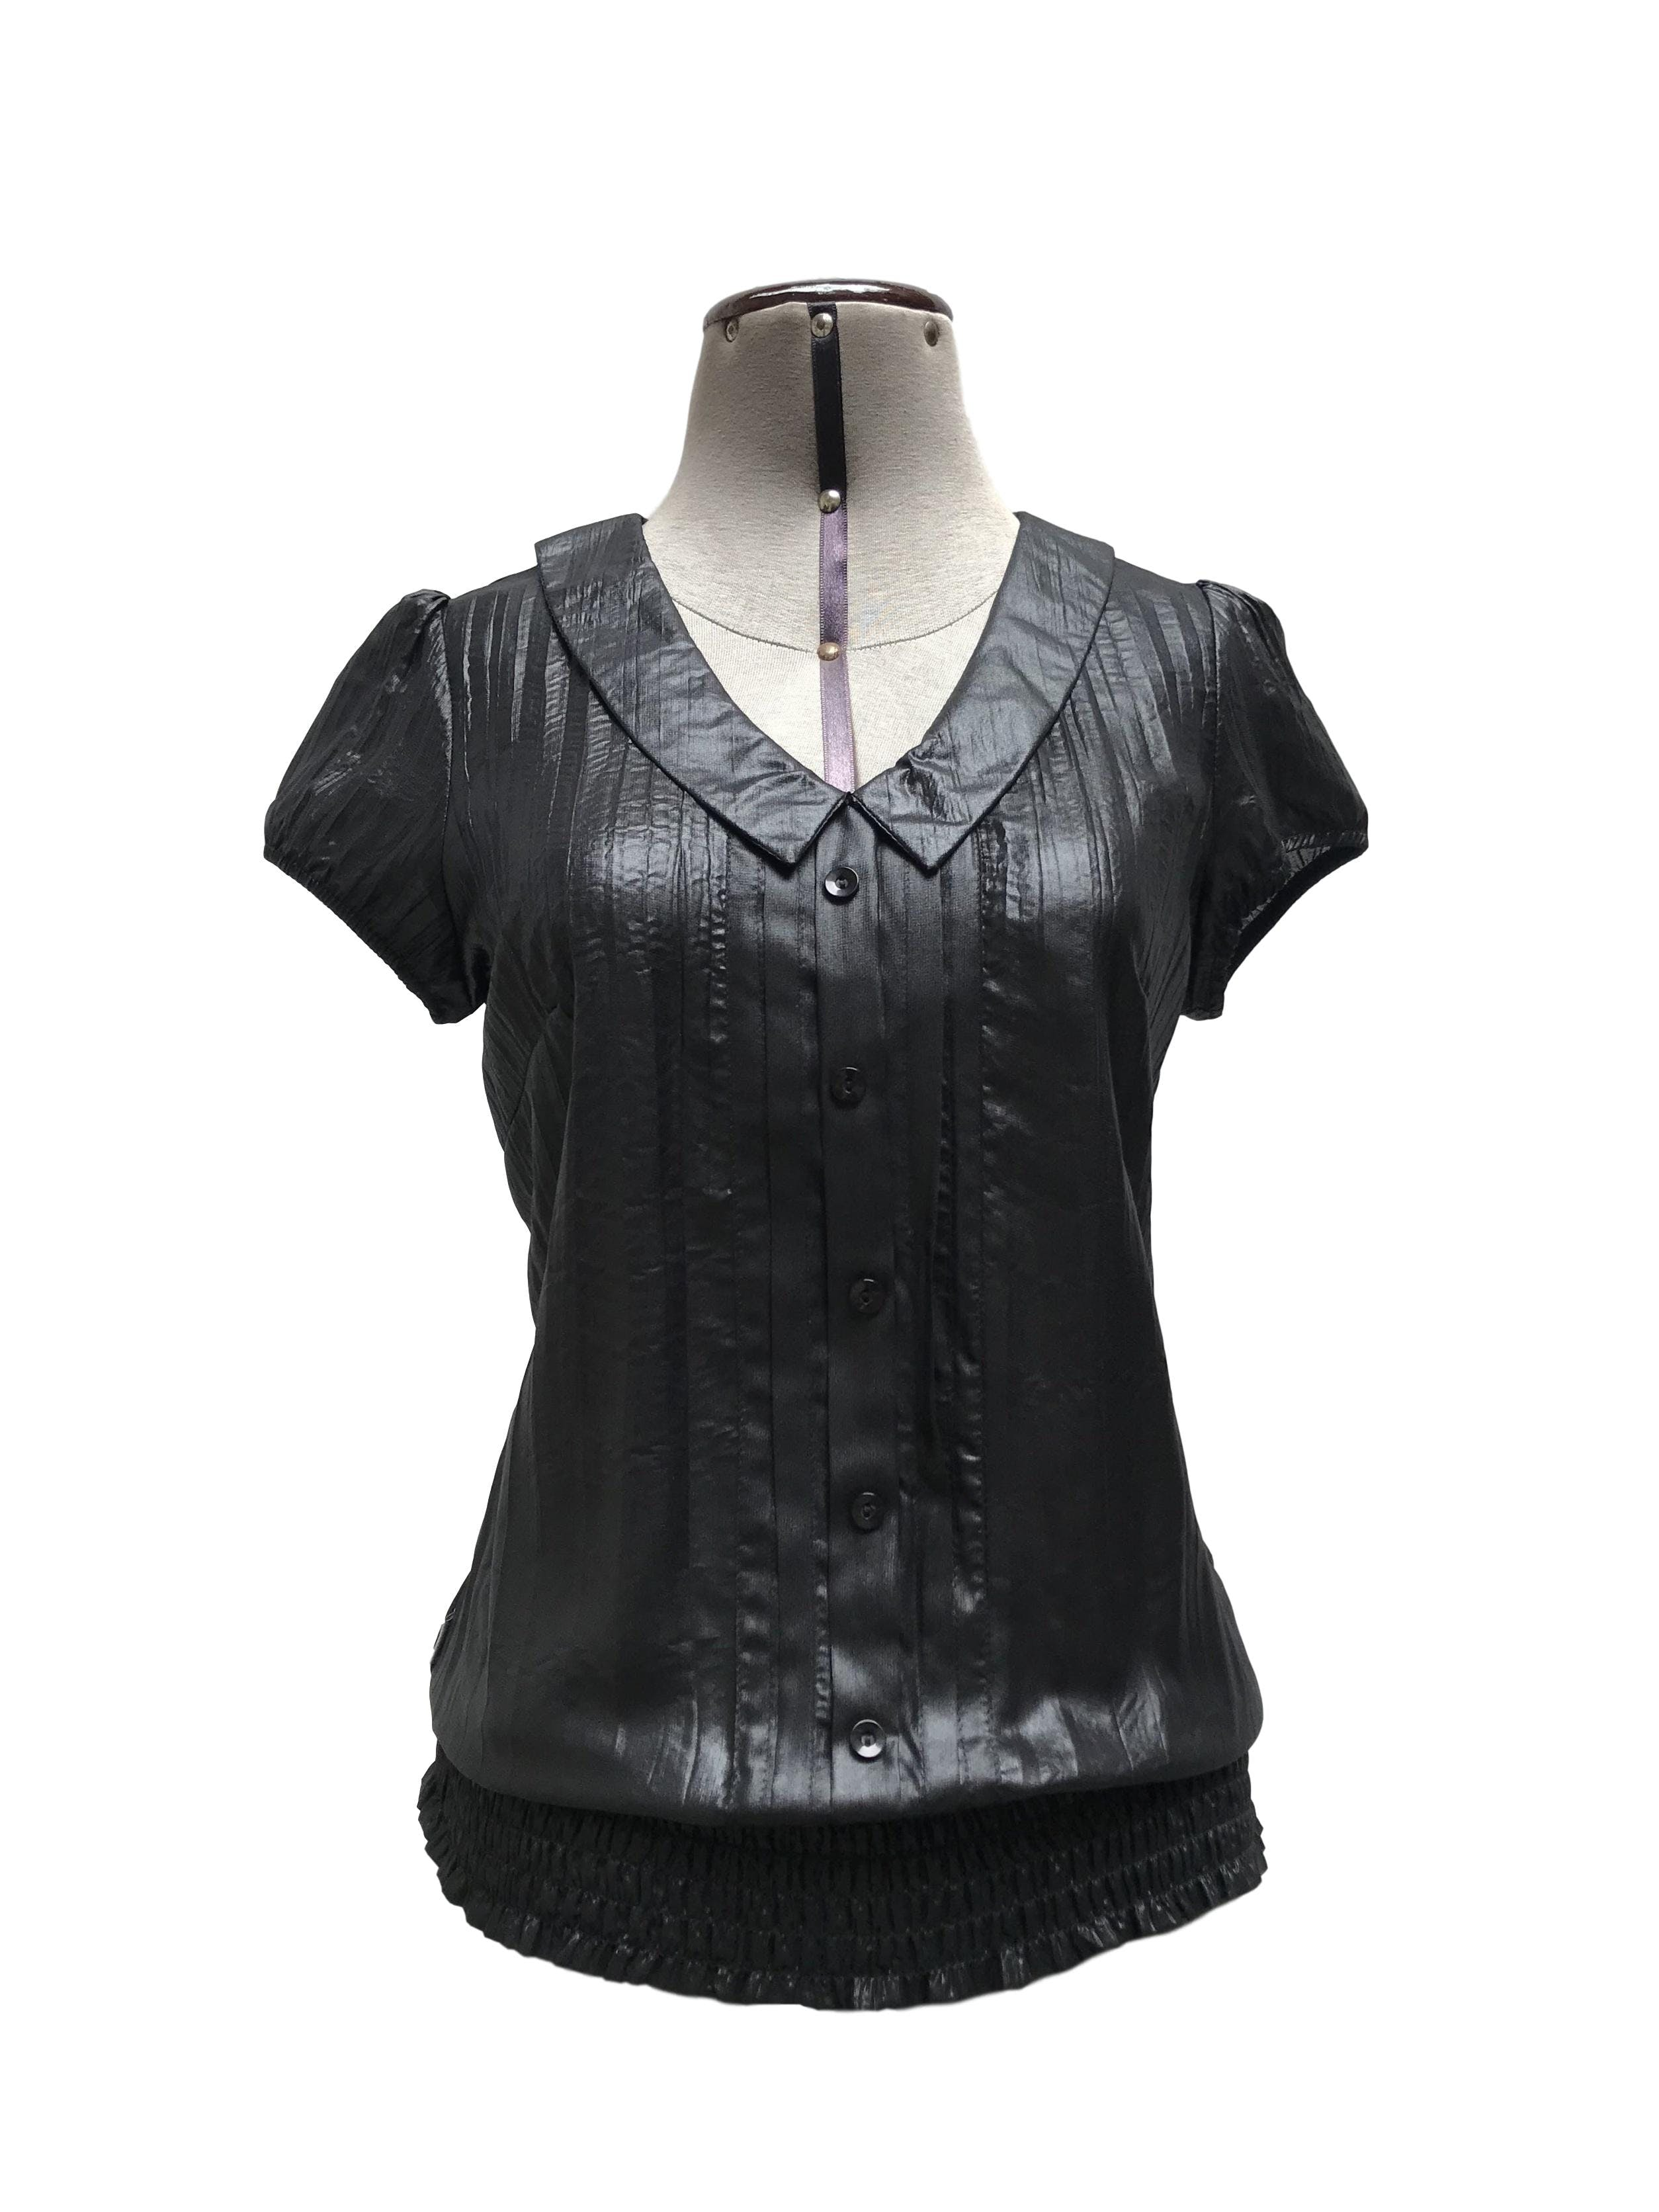 Blusa negra satinada, manga corta y botones, pretina con panal de abeja Talla S